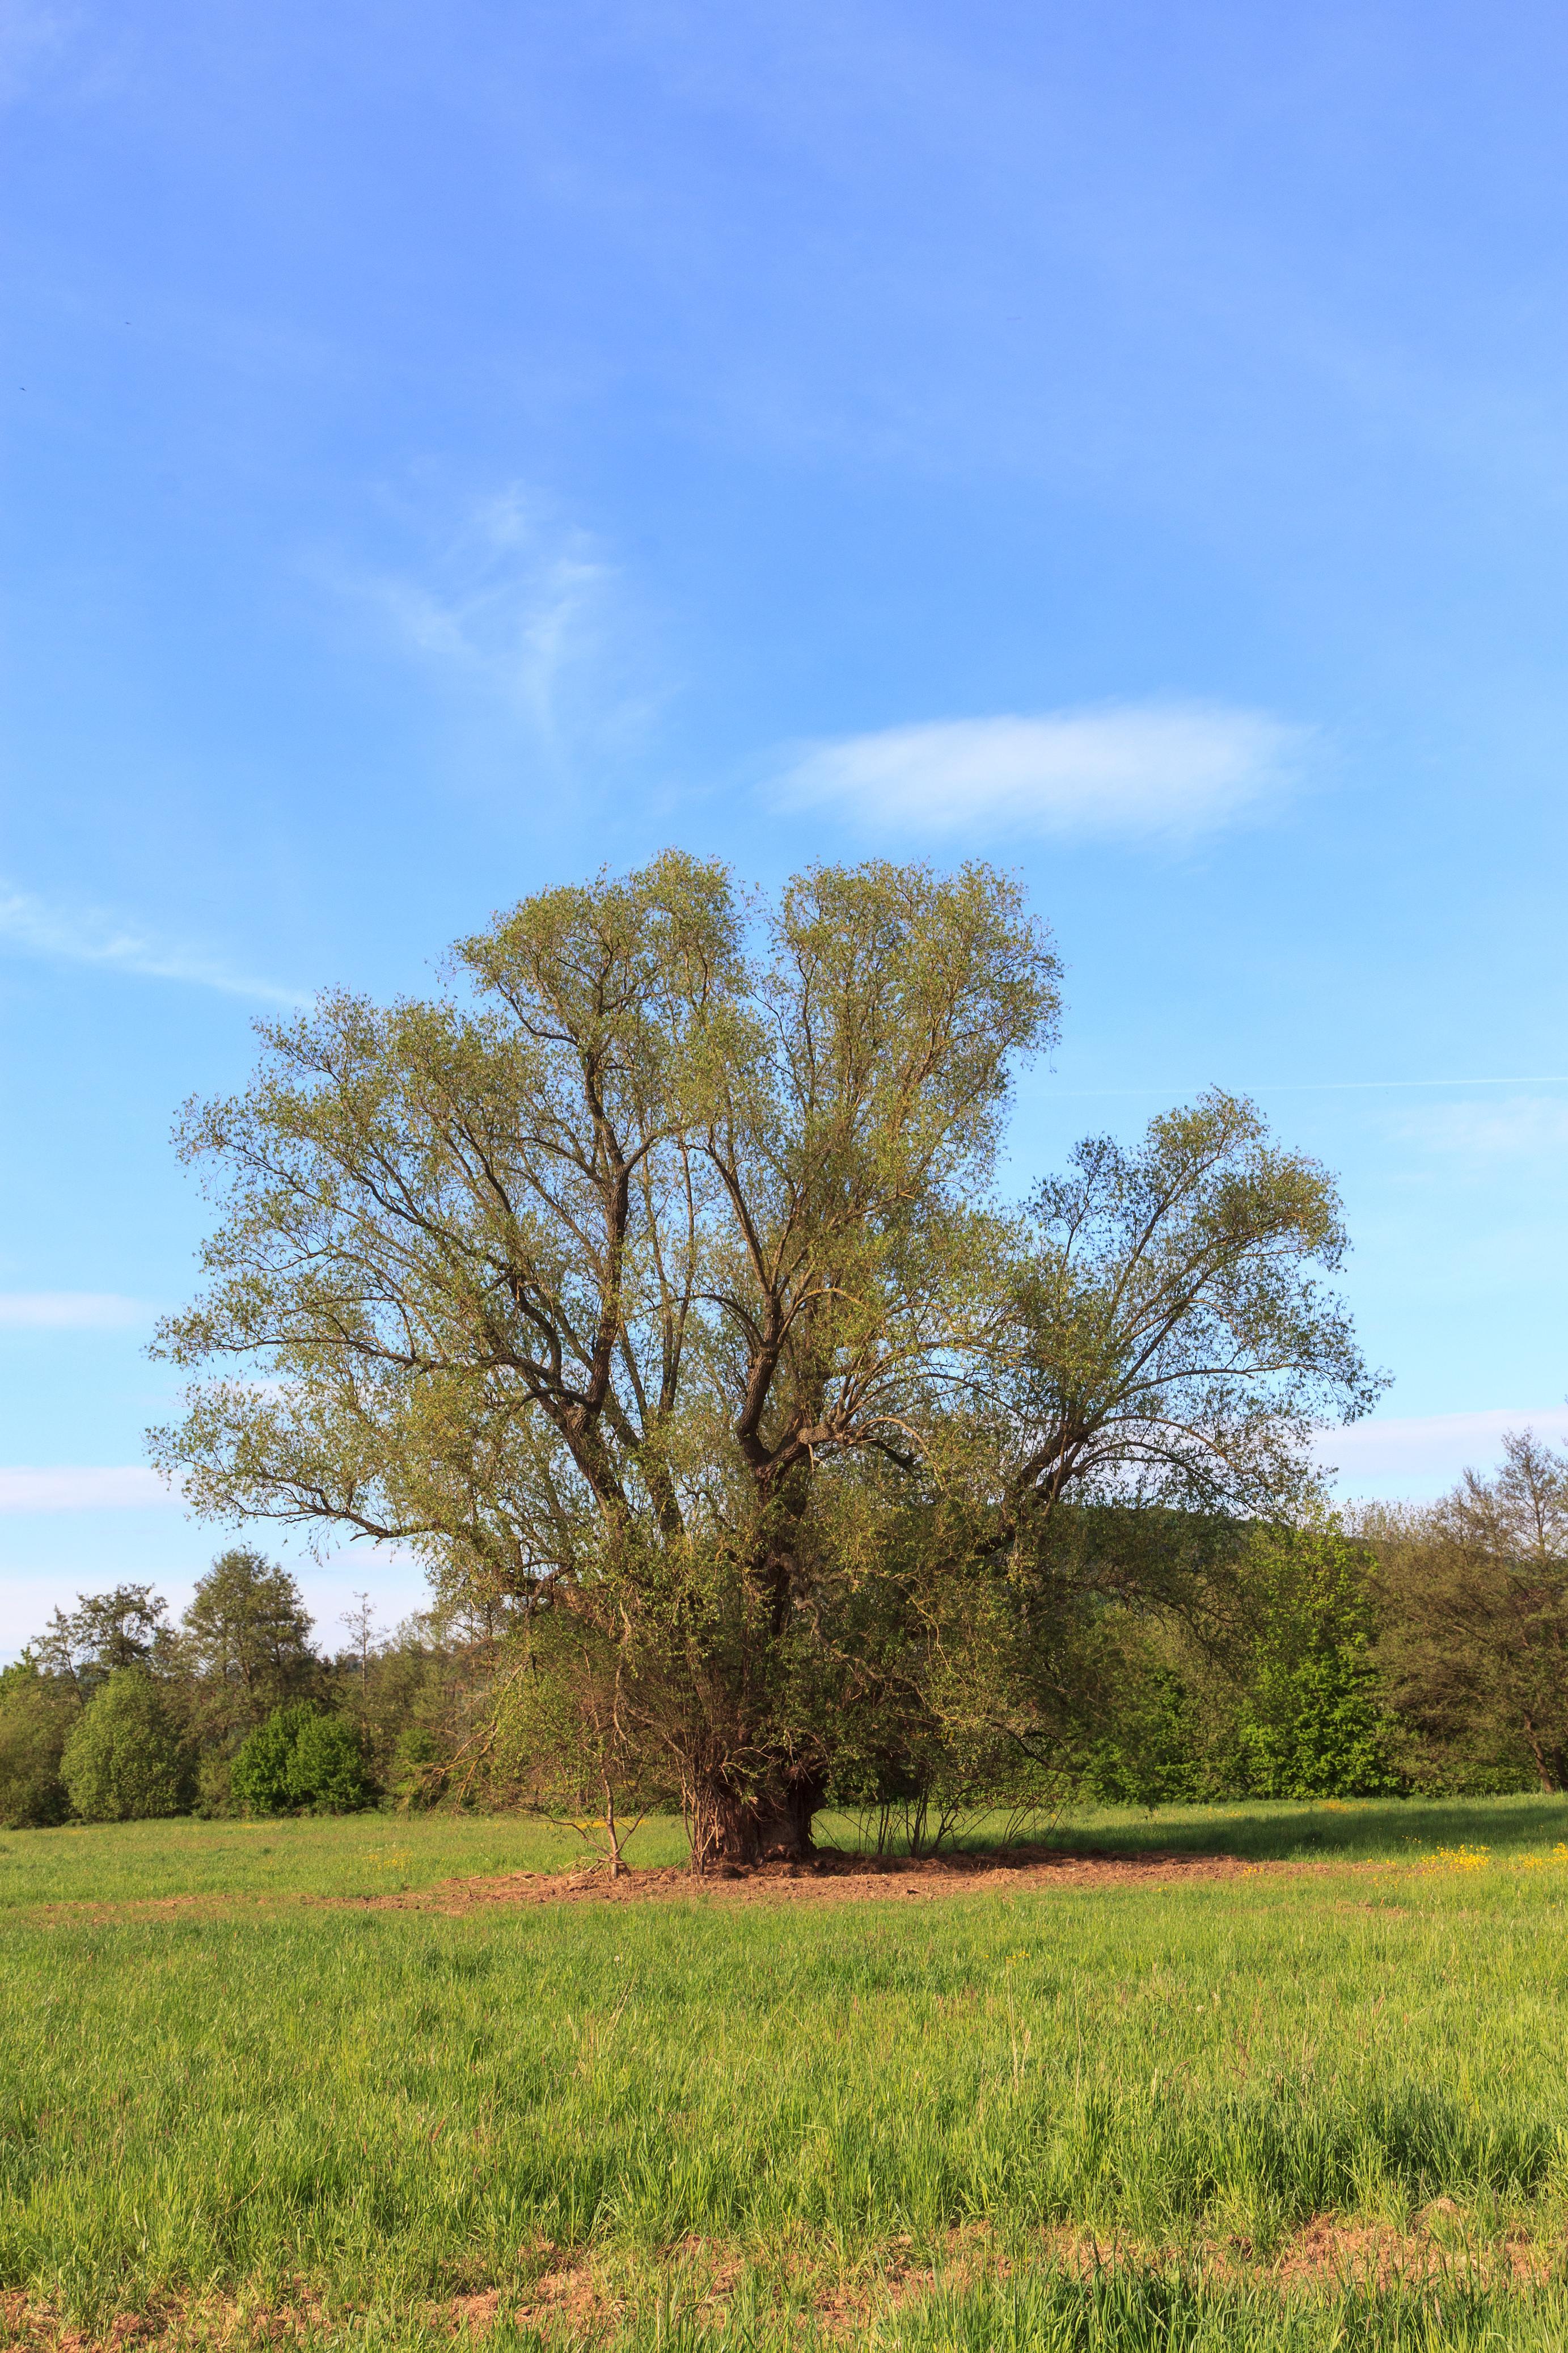 Salix alba_wikimedia commons